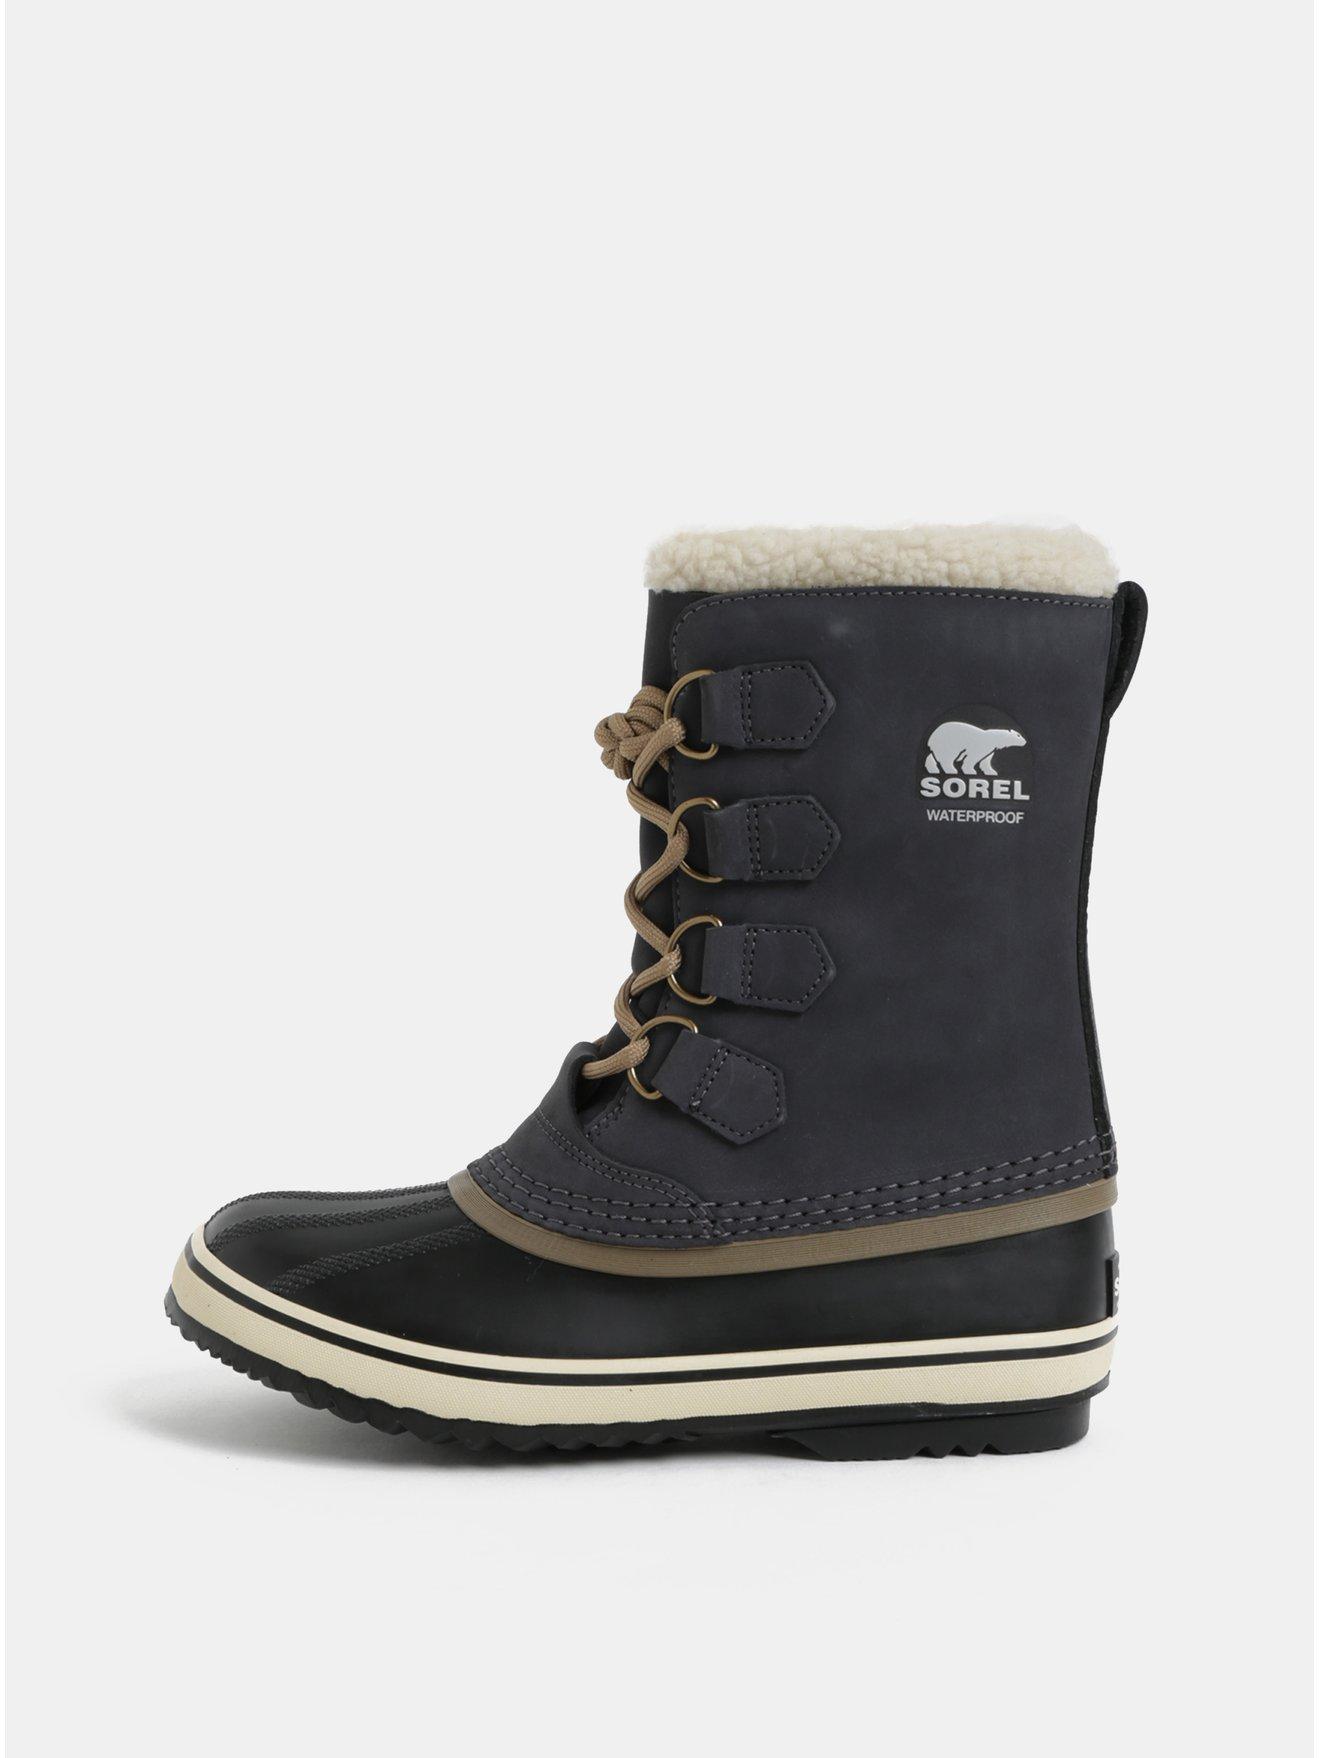 0f706fd9d7ff0 Tmavosivé dámske semišové zimné nepremokavé topánky SOREL 1964 Pac 2